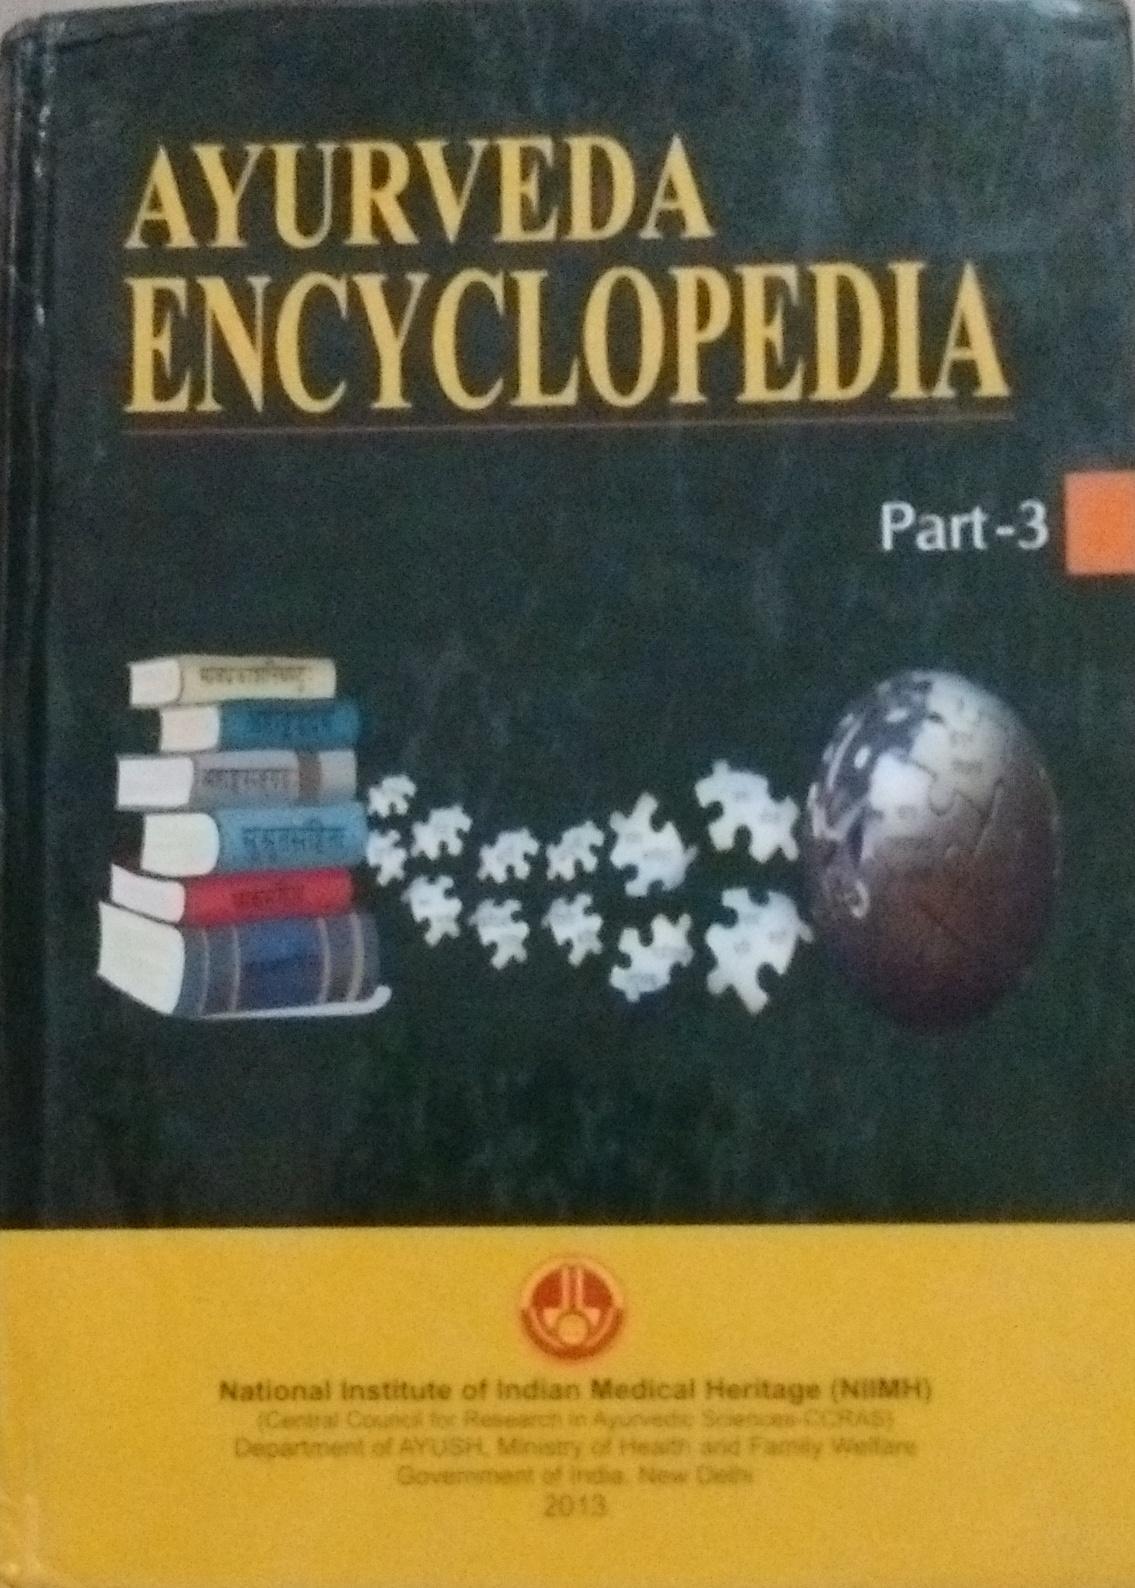 Ayurveda Encyclopedia (Sanskrit Text with Hindi Translation